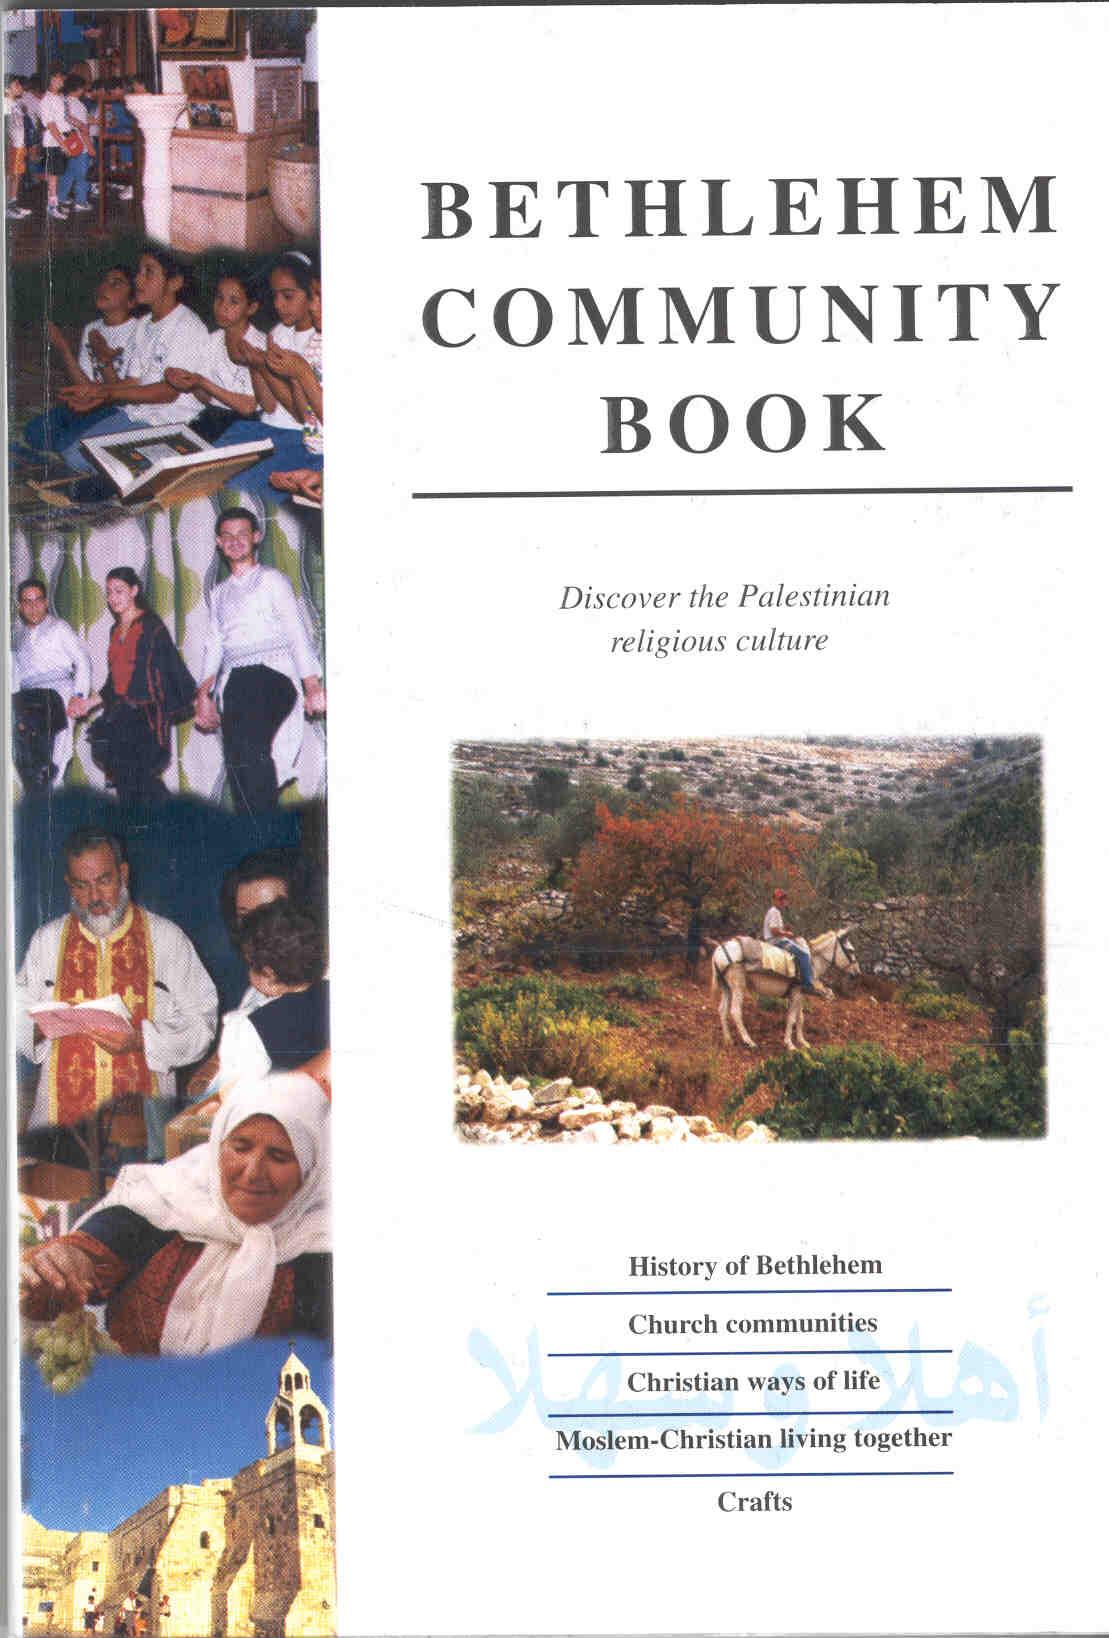 bethlehemcommunitybook.jpg